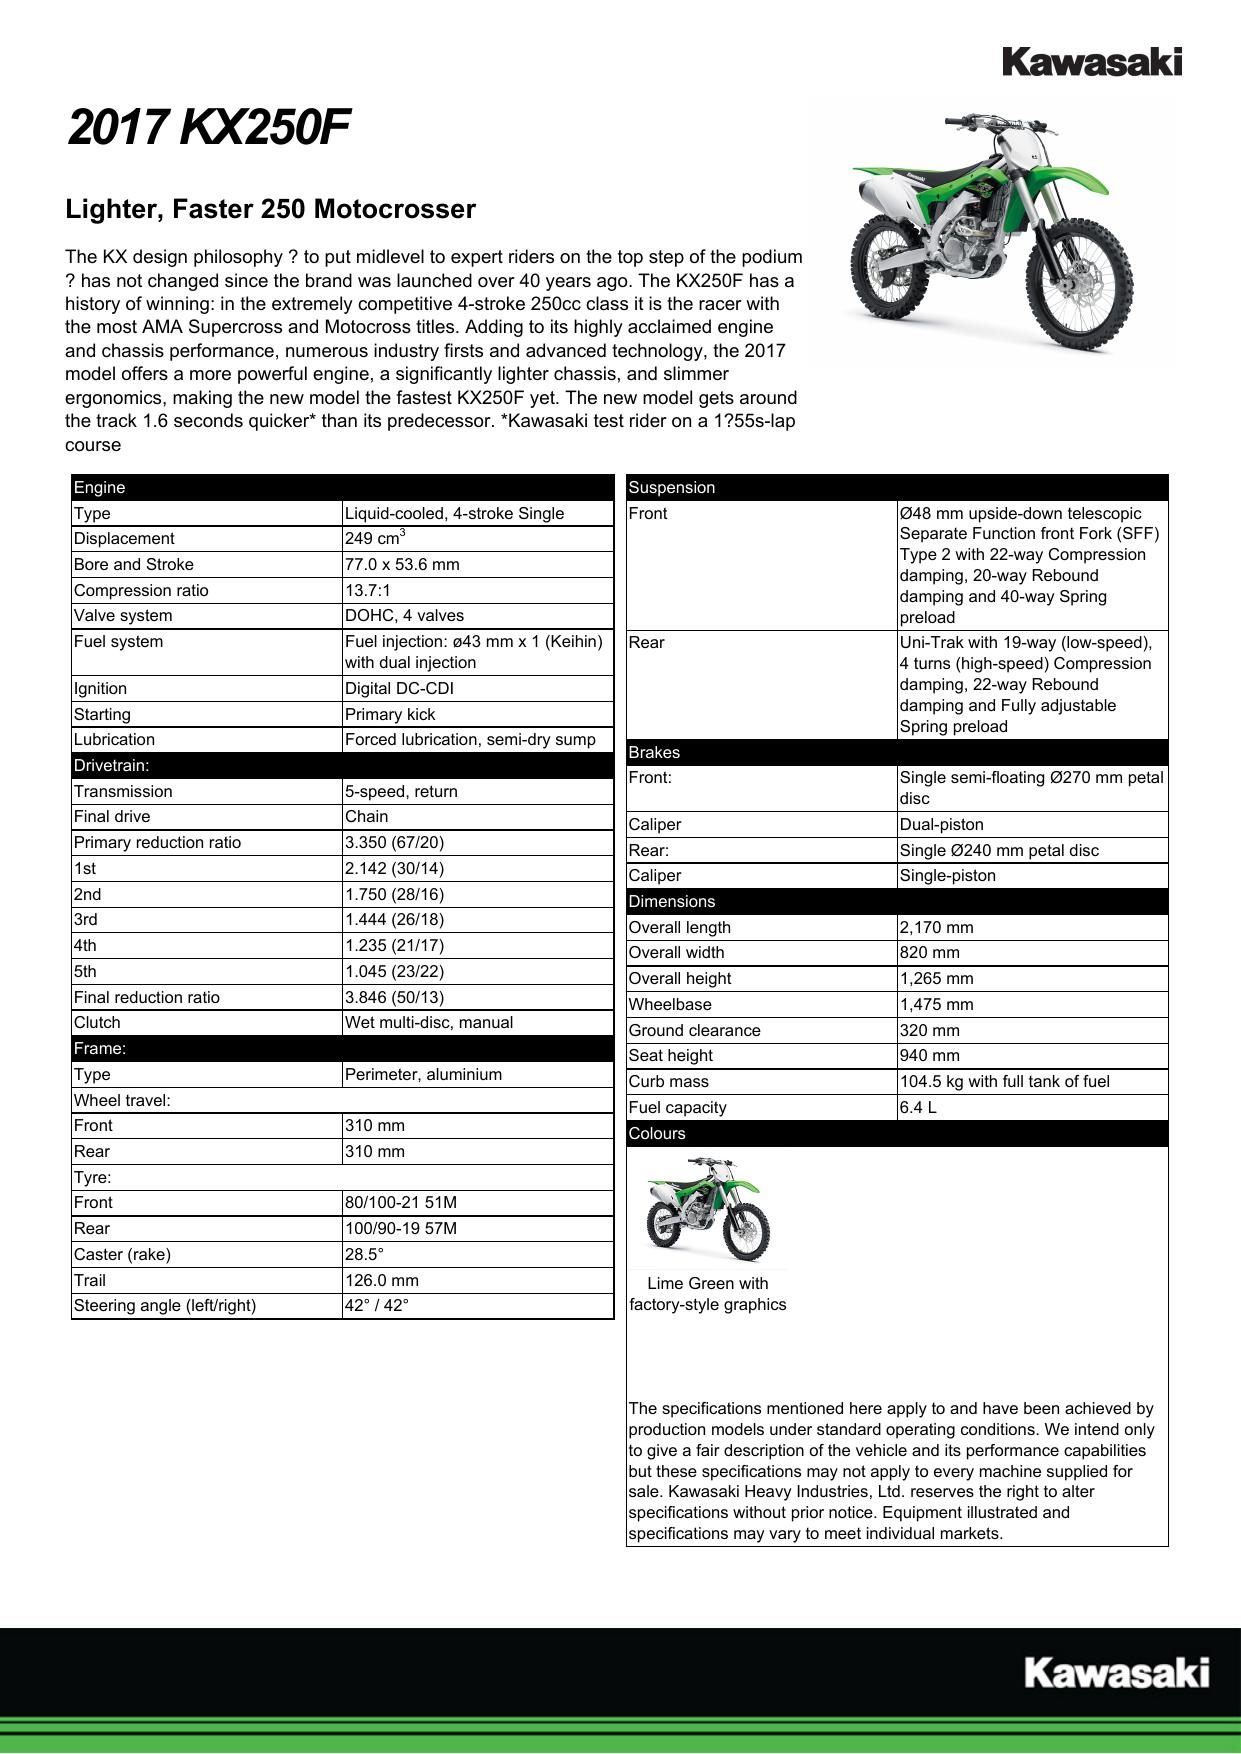 2017 Kx250f Ultimate Kawasaki Ipswich Manualzz